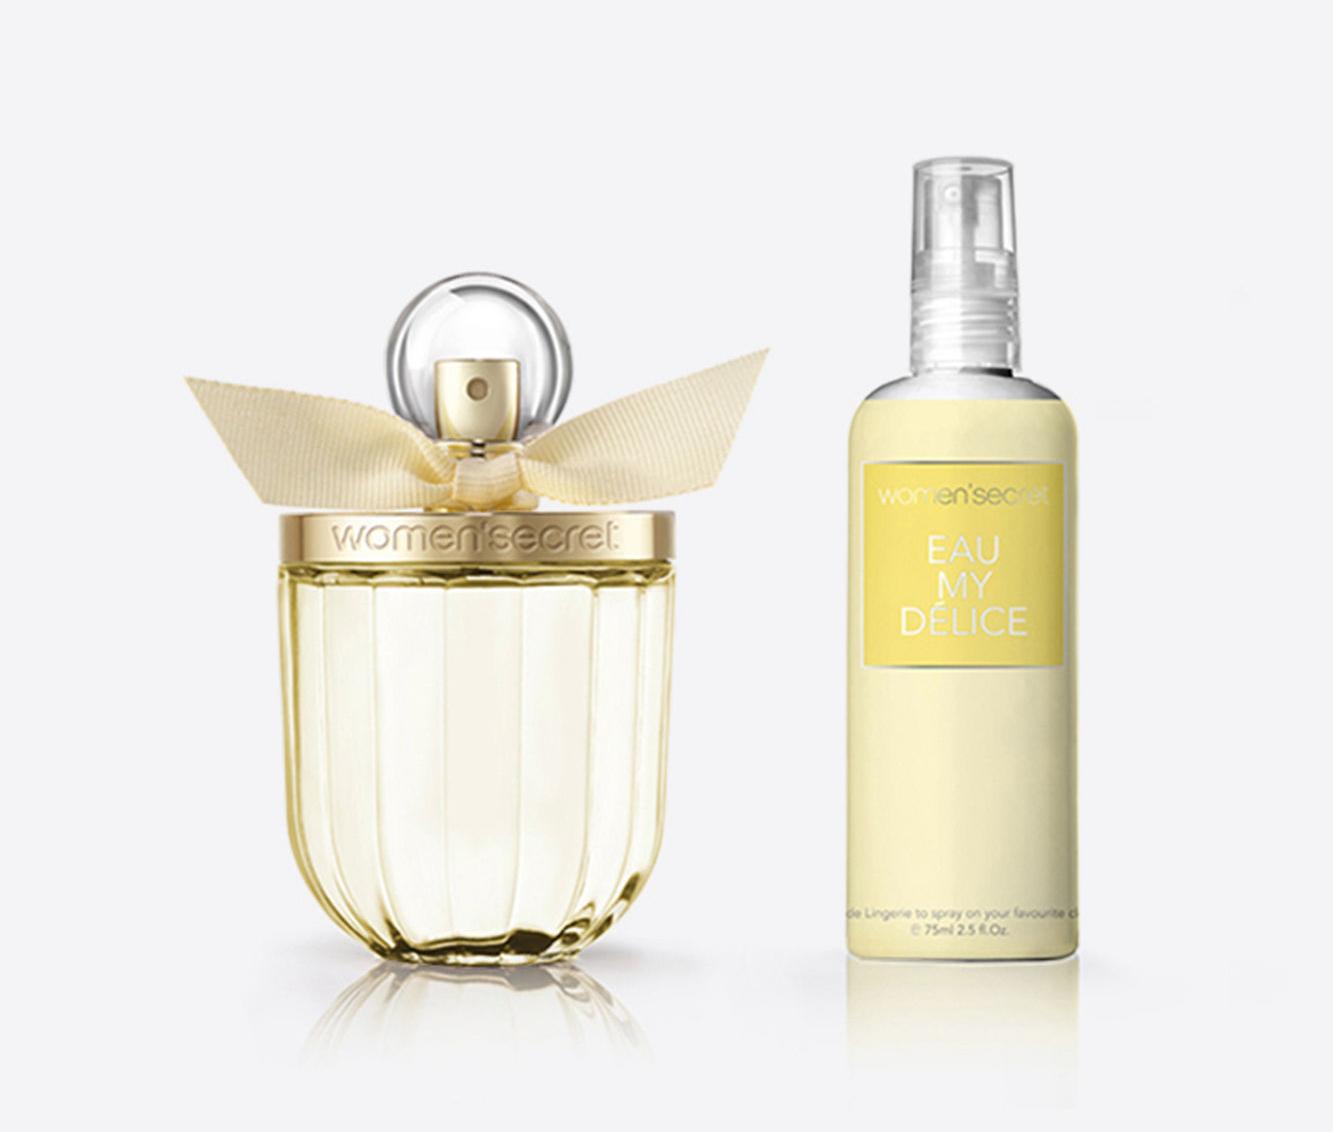 d9e2a5c39 Eau My Delice Women Secret perfume - a fragrância Feminino 2016